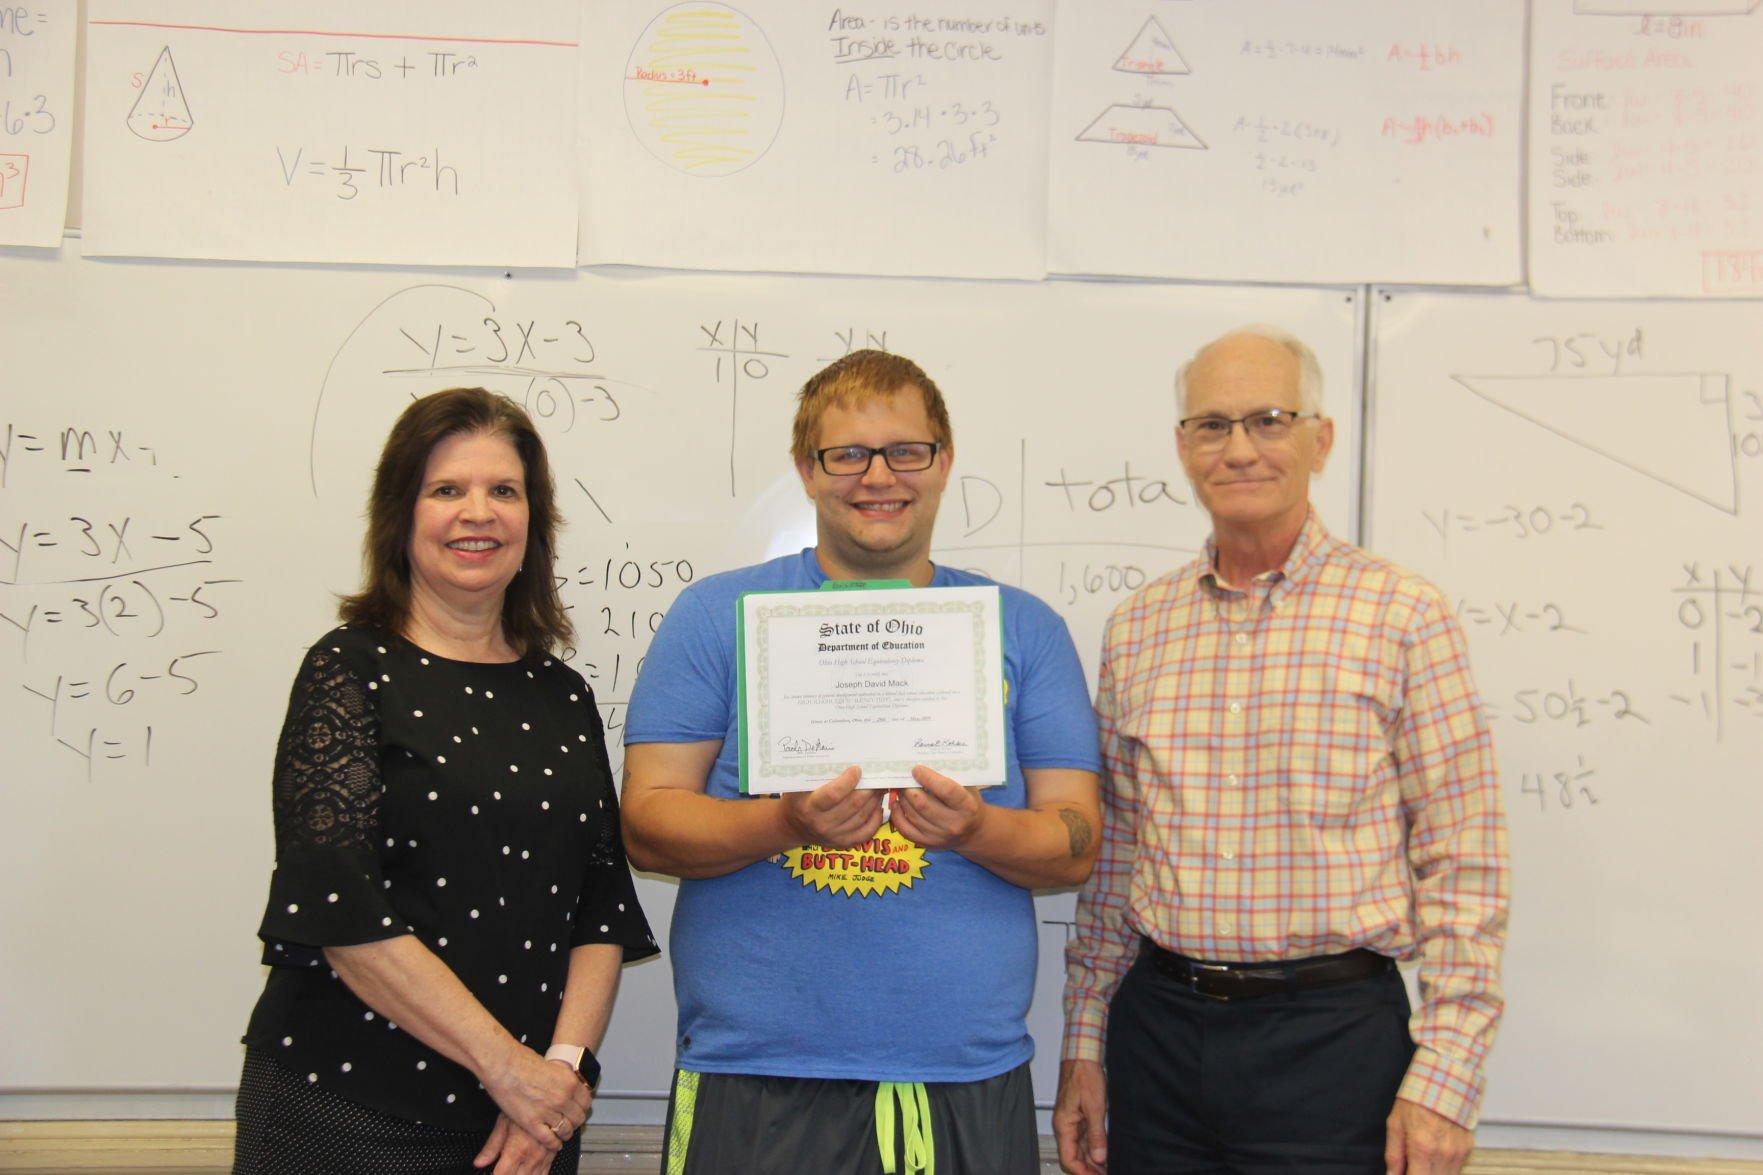 Mansfield adult education program to graduate 116 individuals on June 6